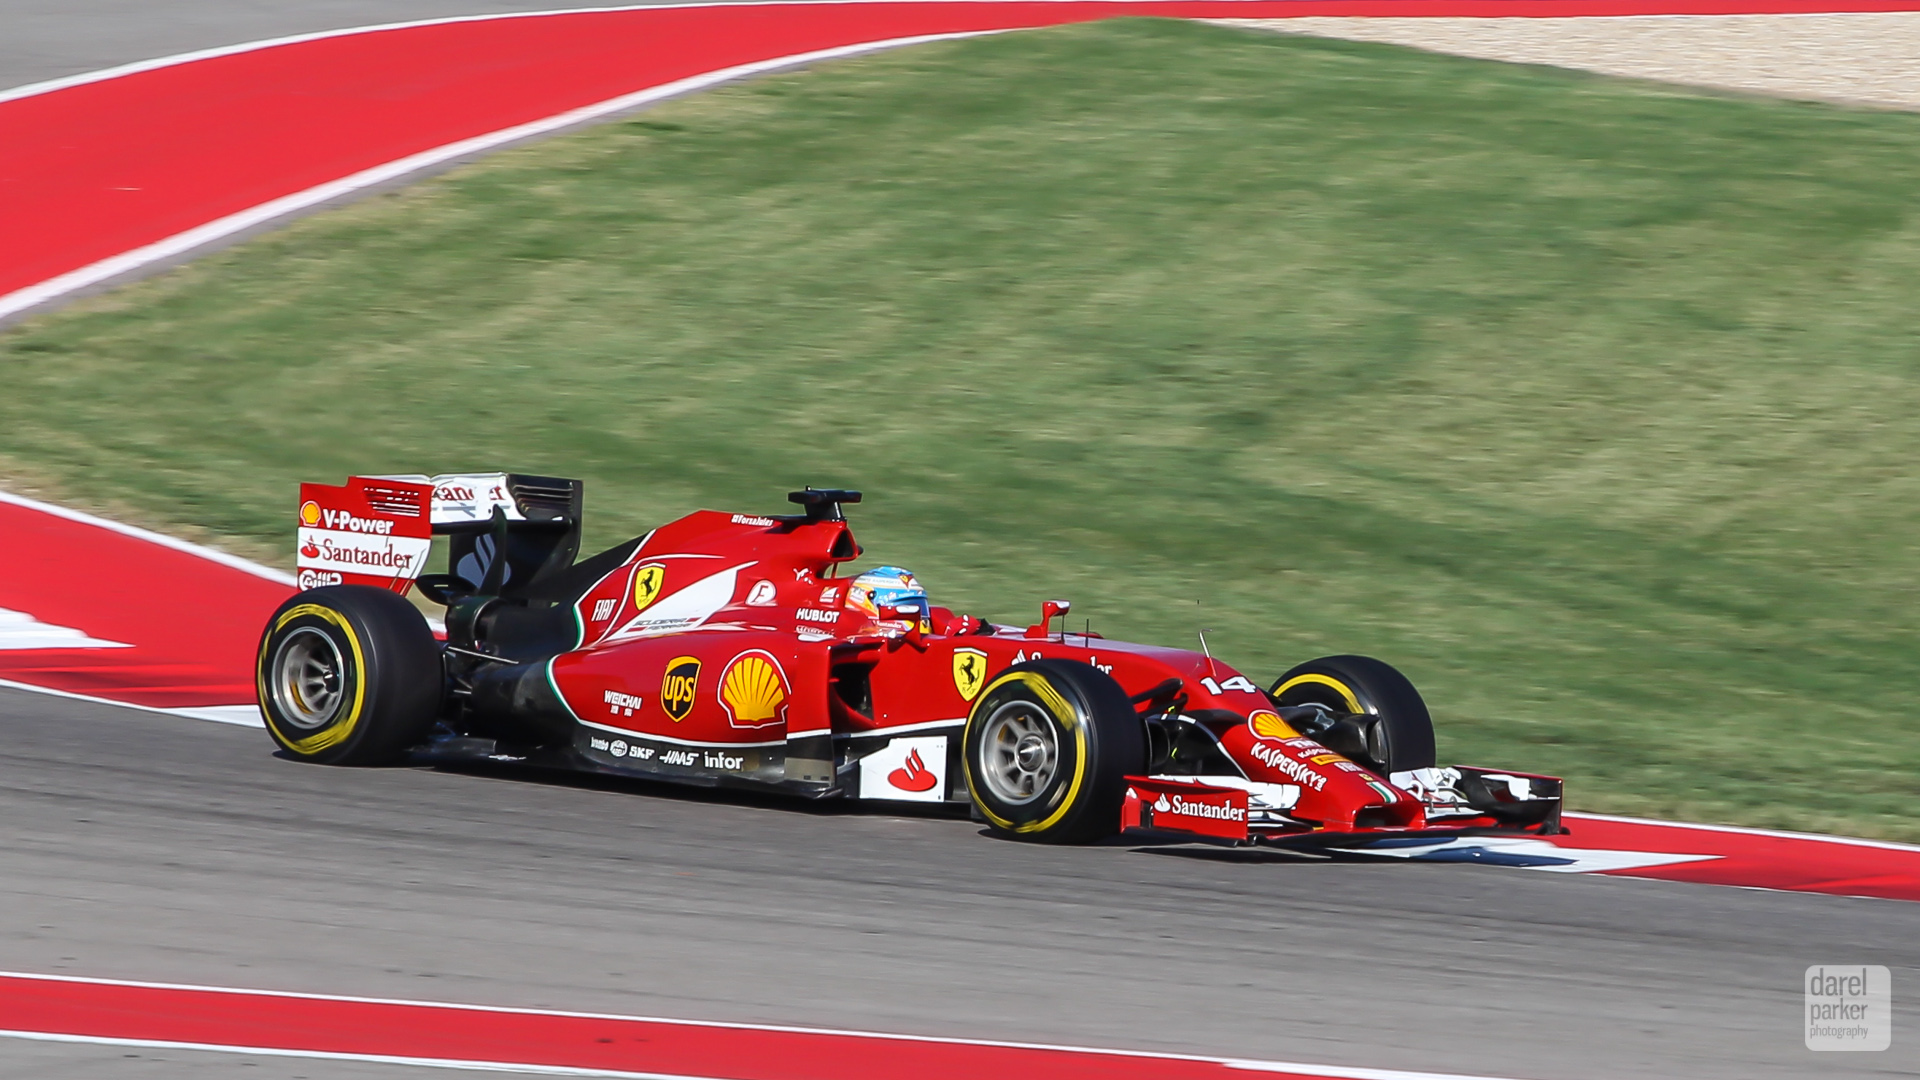 Fernando Alonso's Ferrari F14-T